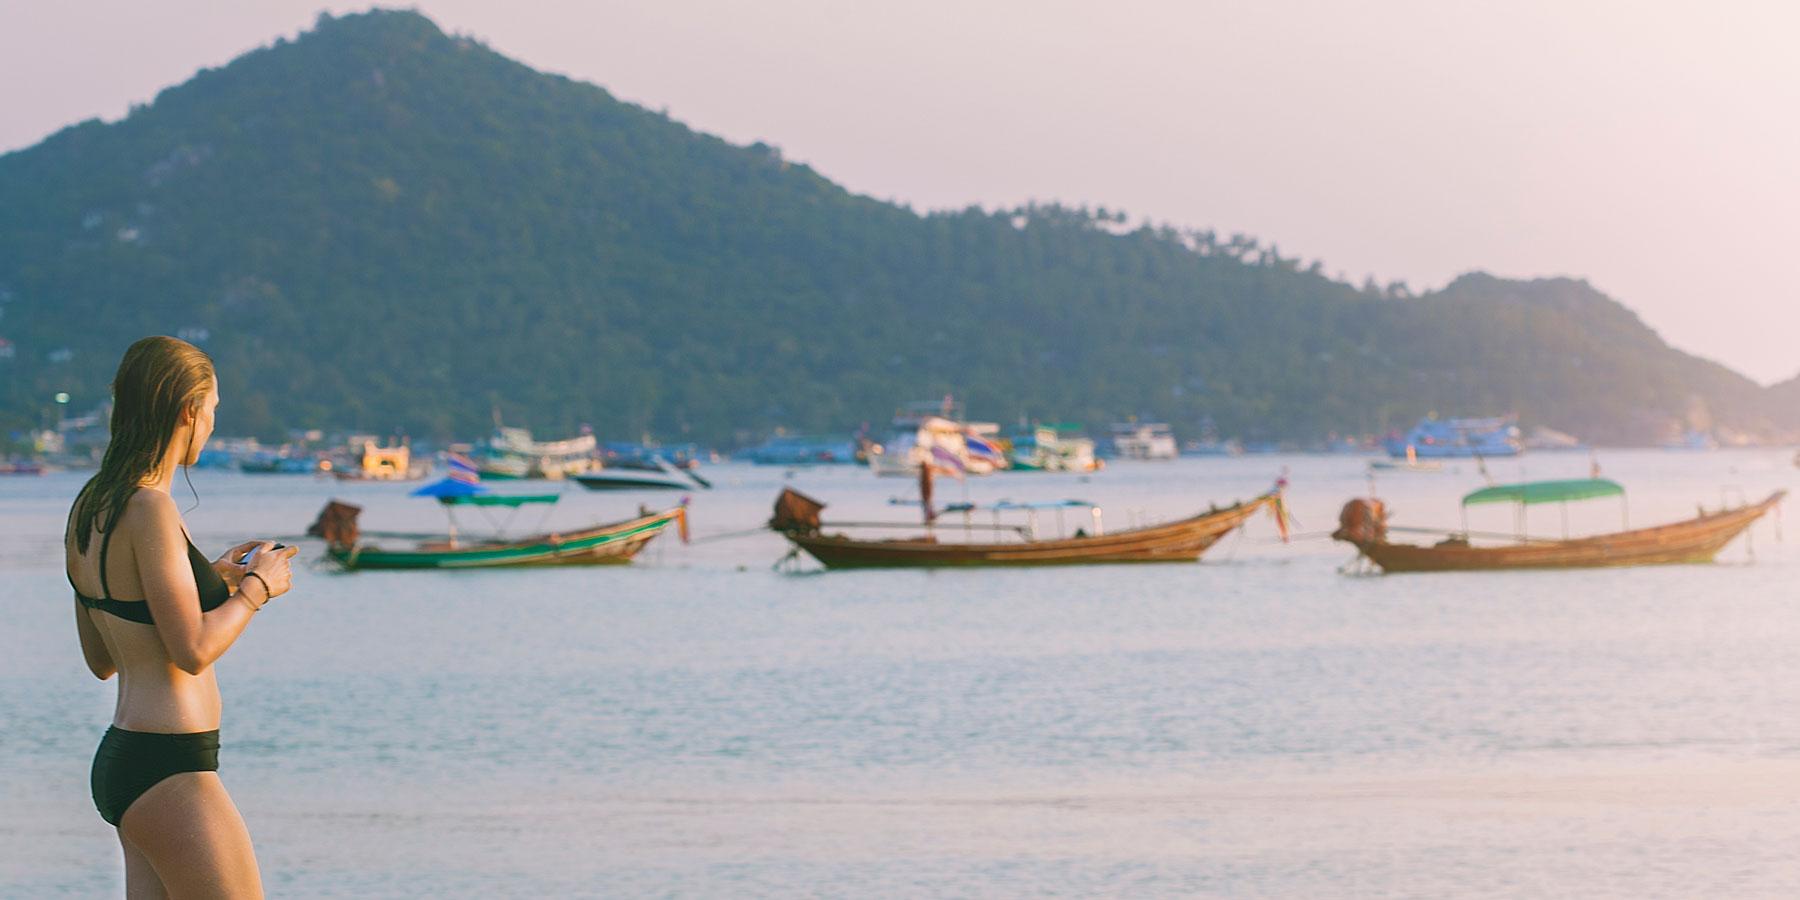 Jess in Ko Tao, Thailand